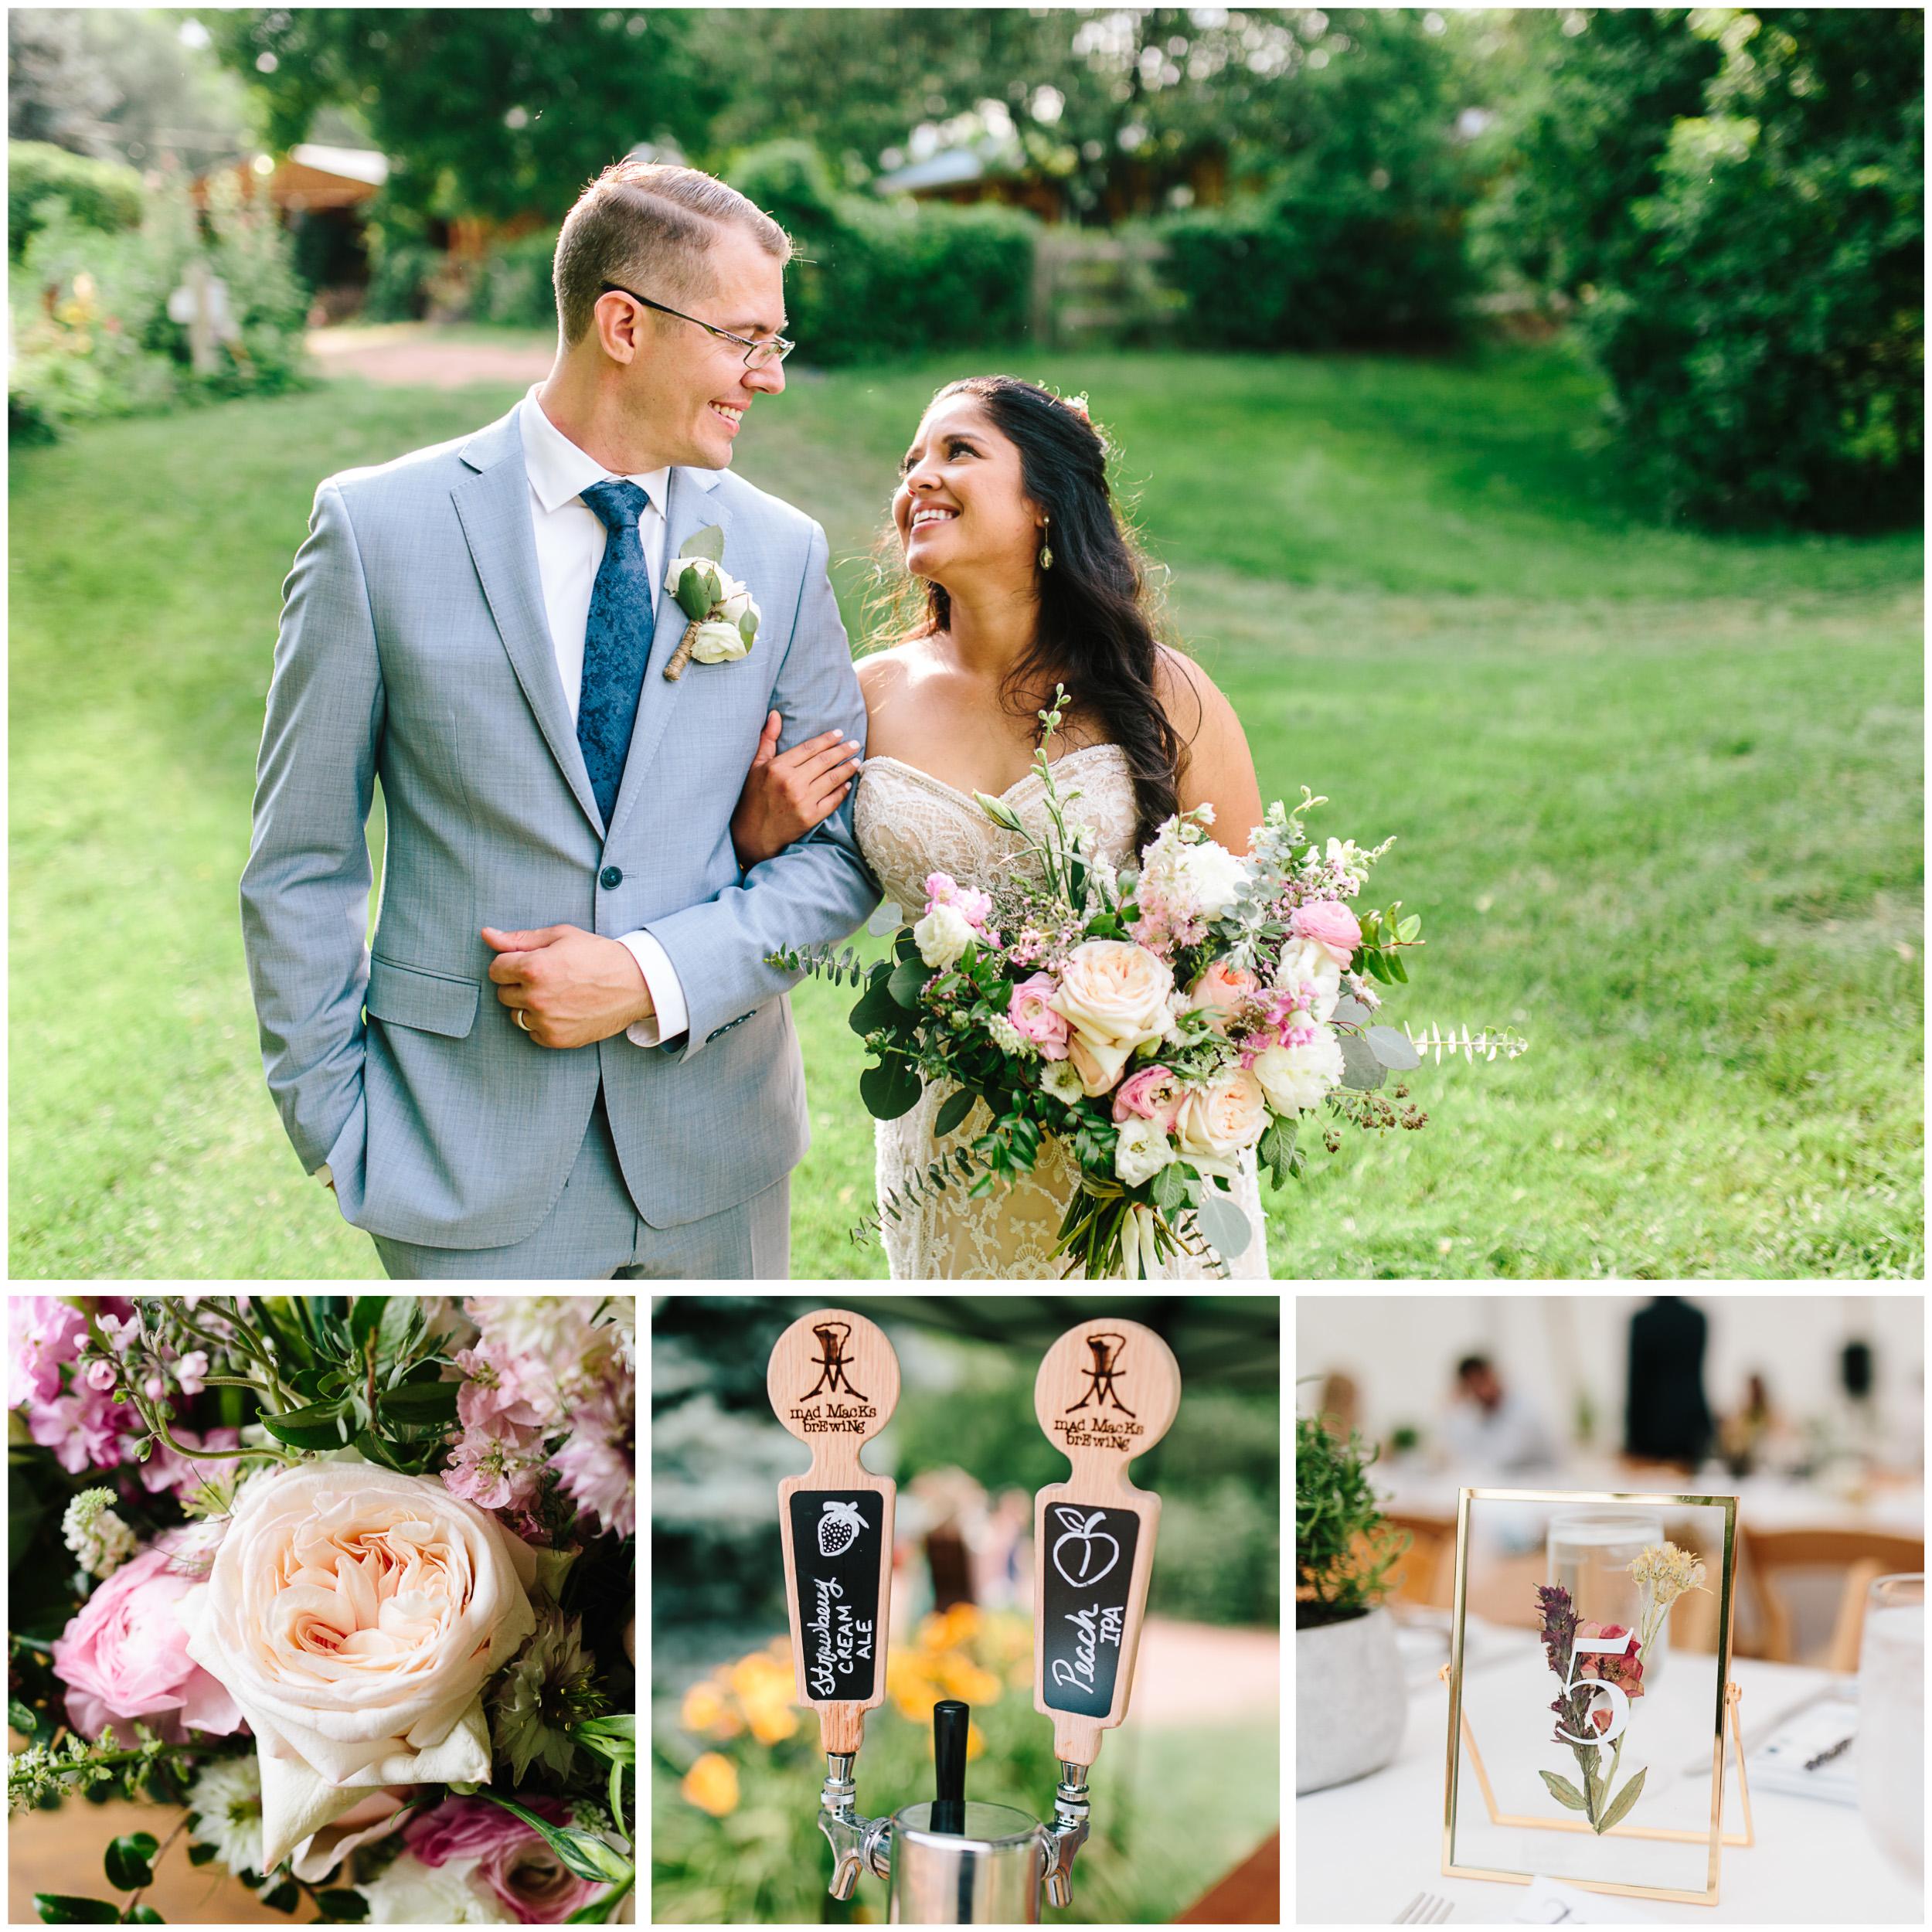 lyons_farmette_wedding_header.jpg